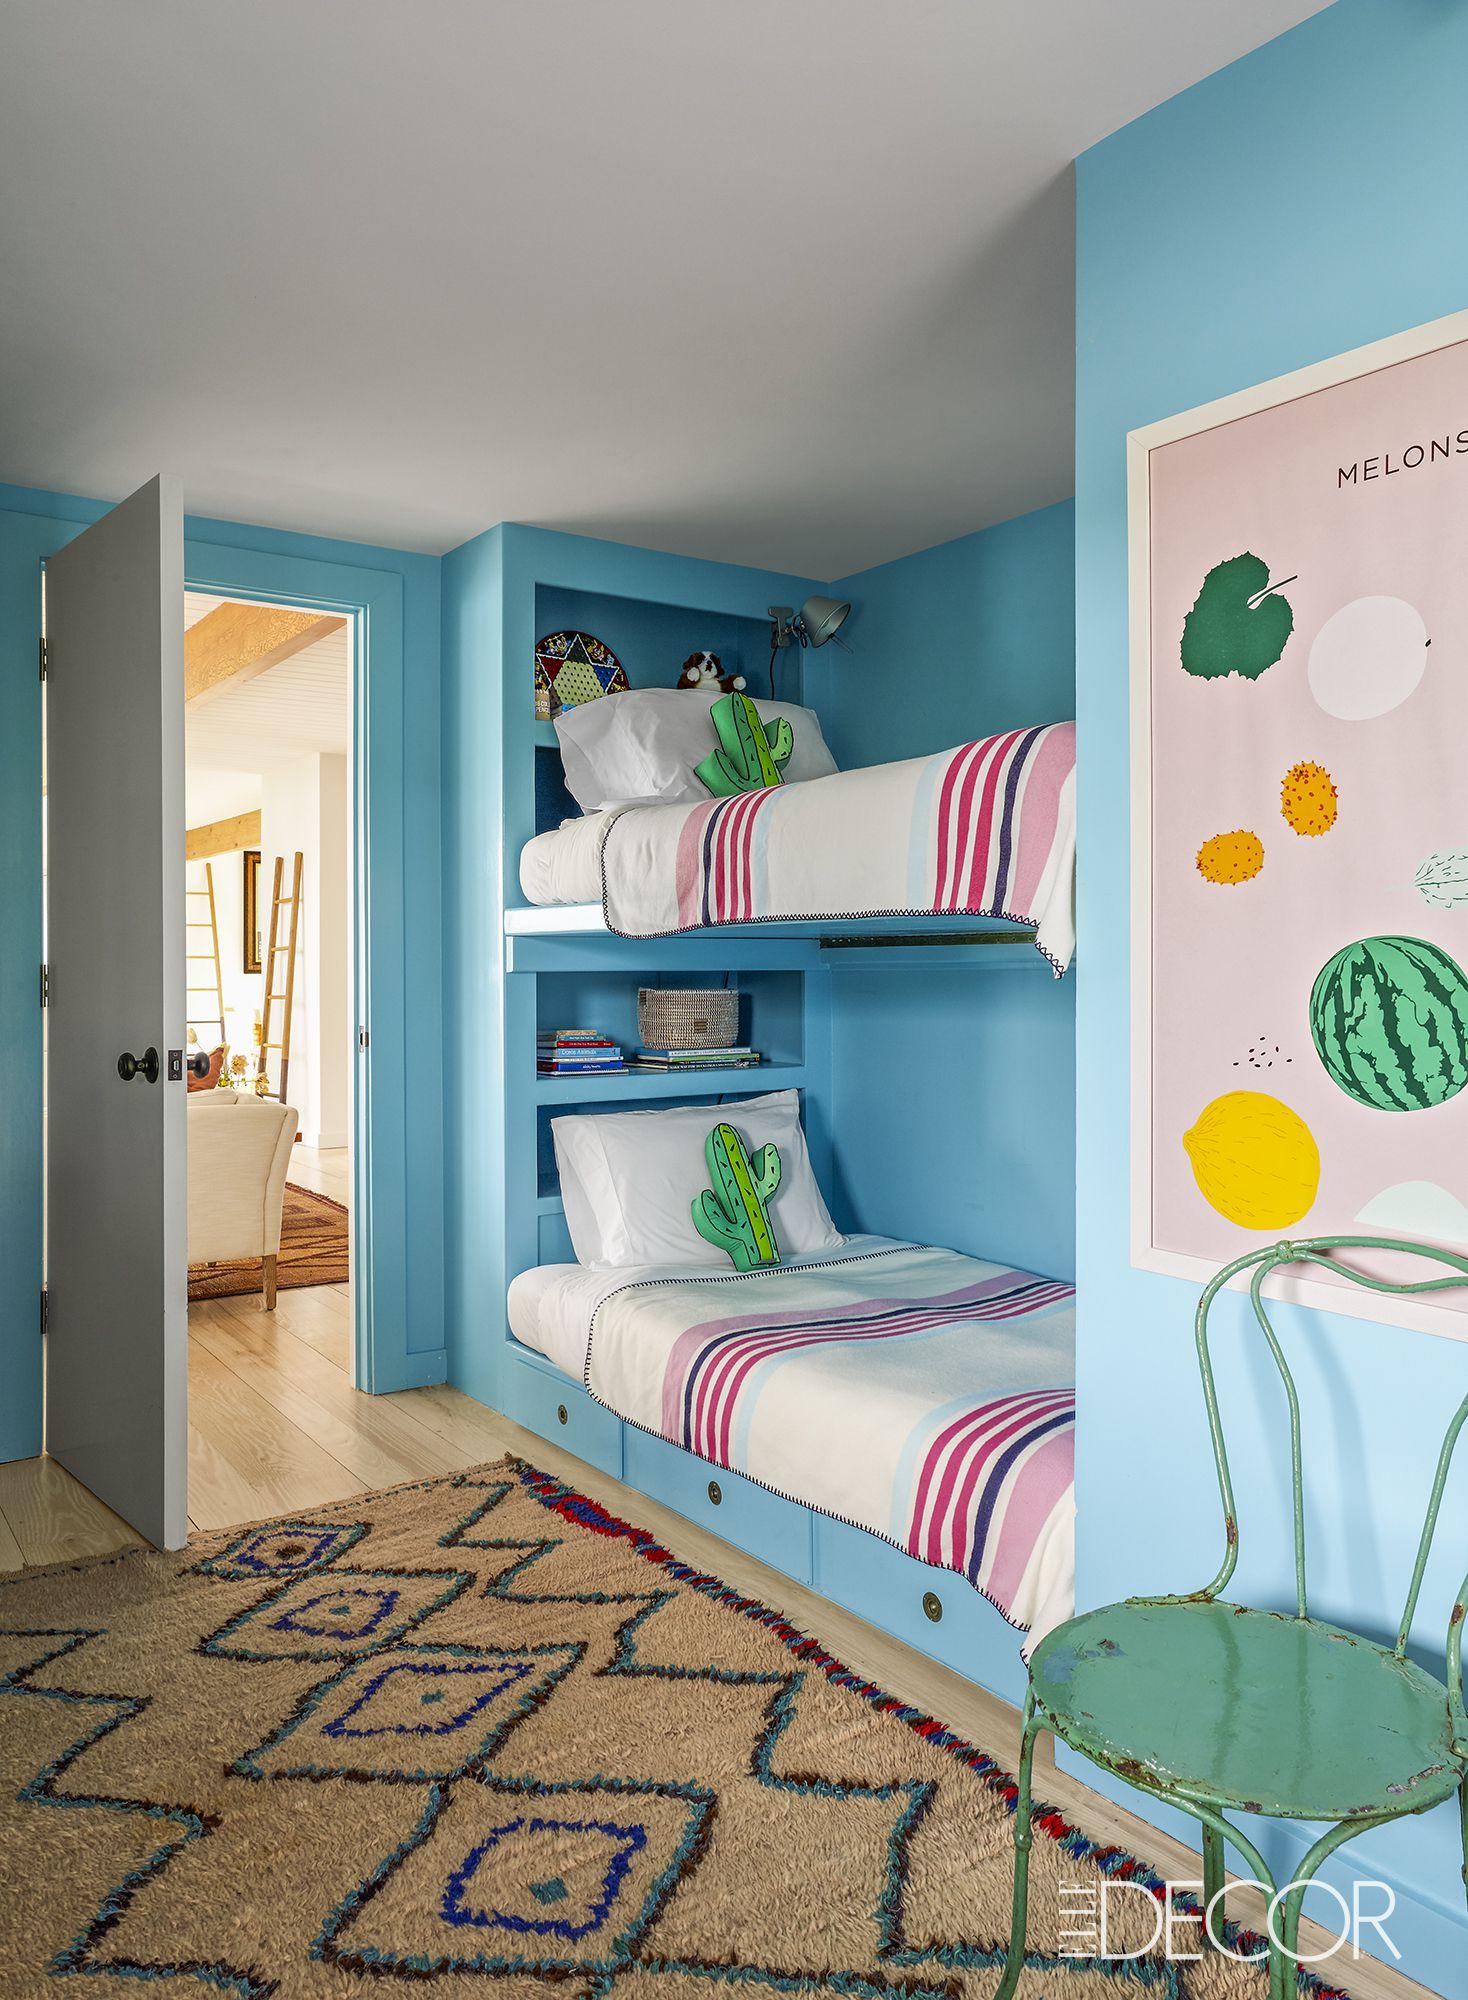 Children's room 18 cool kidsu0027 room decoration ideas - Children's room decoration NTVHGQB